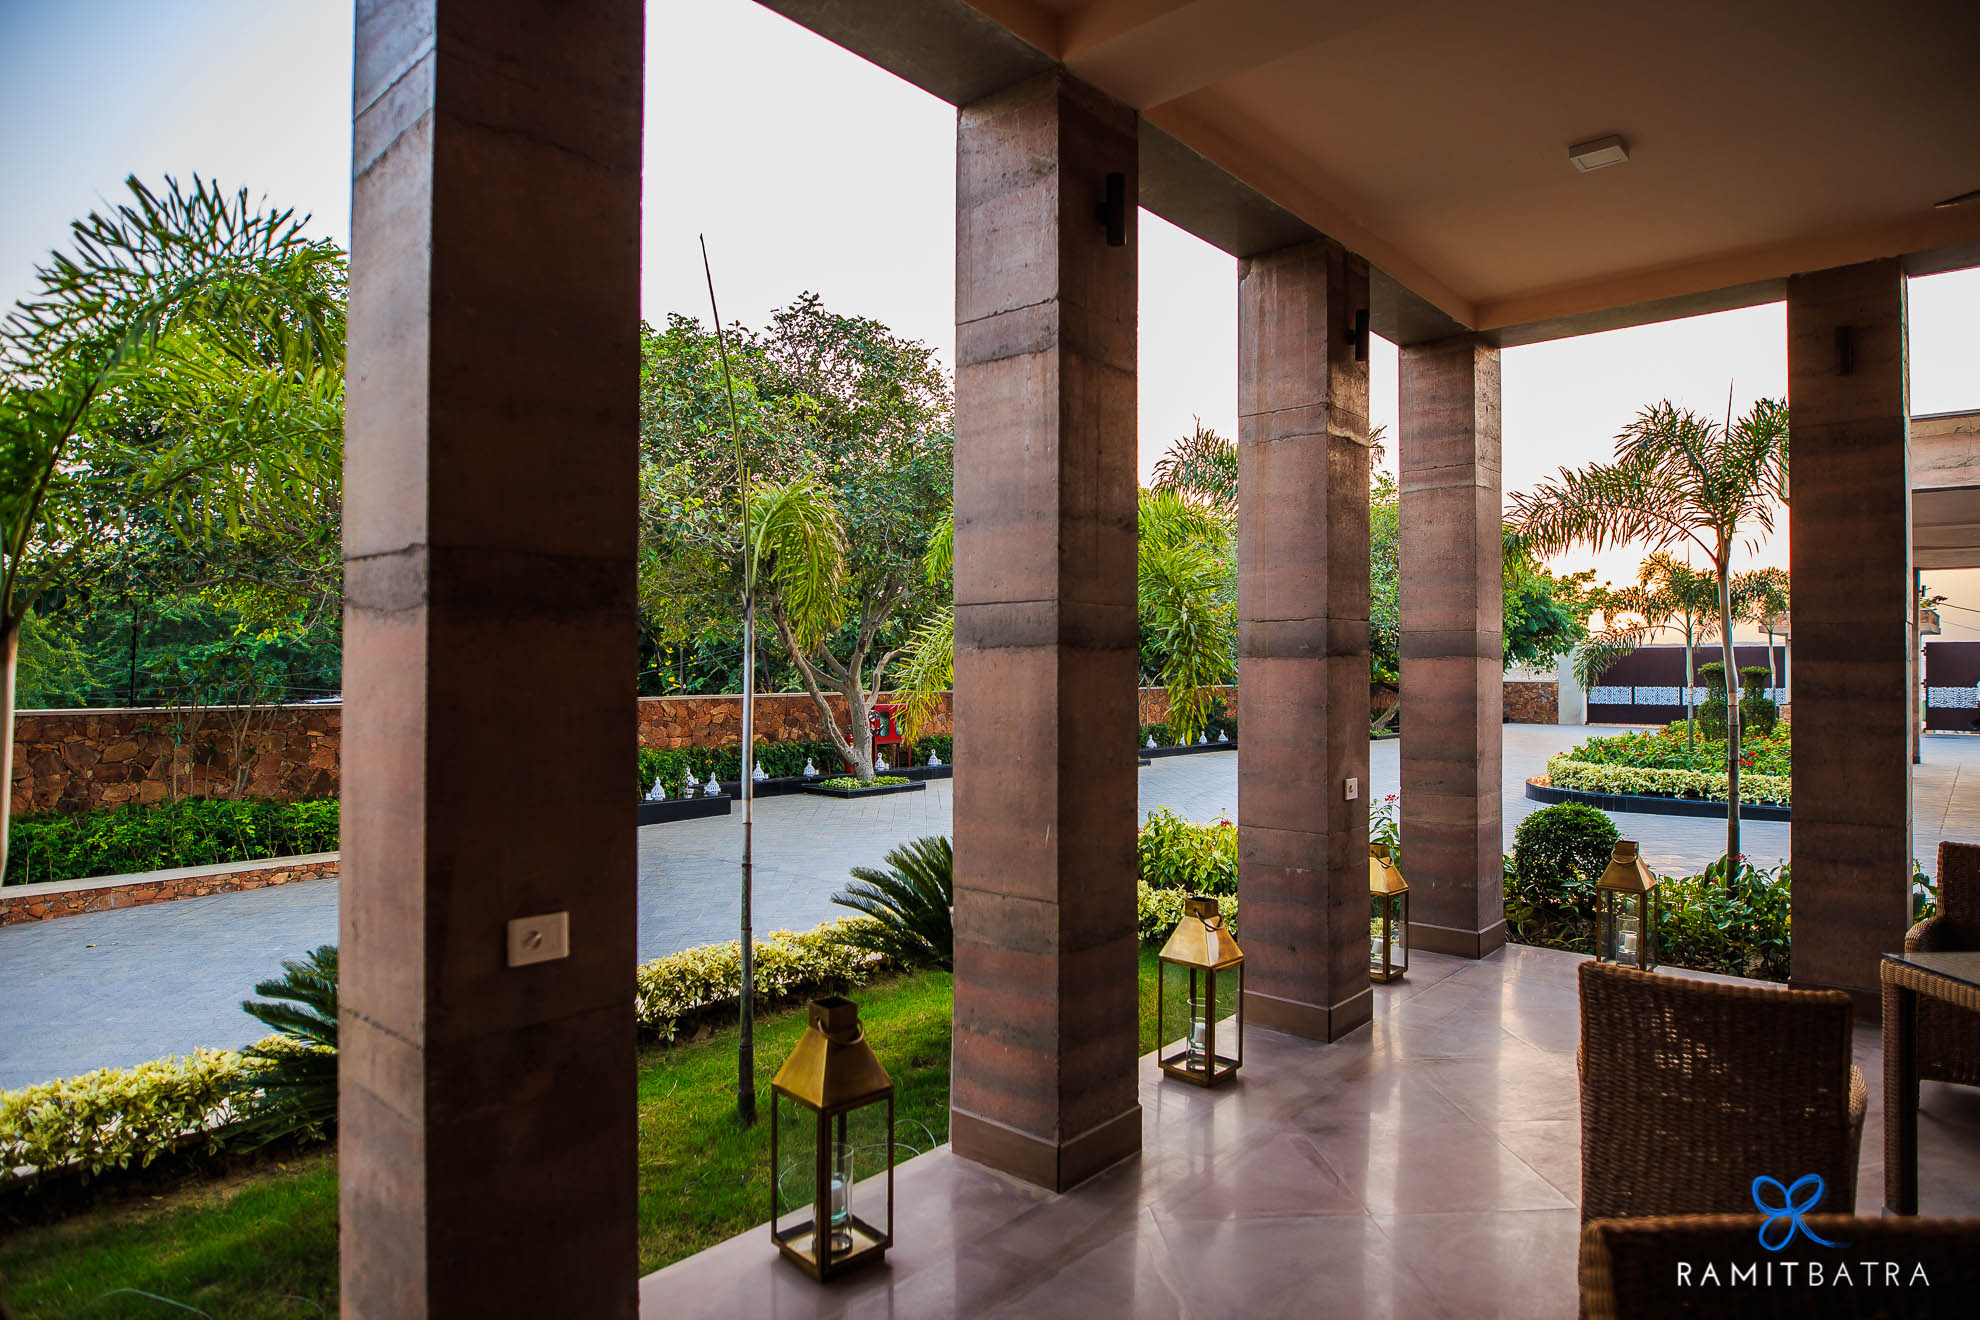 lalit-mangar-hotel-near-delhi-ramitbatra-026